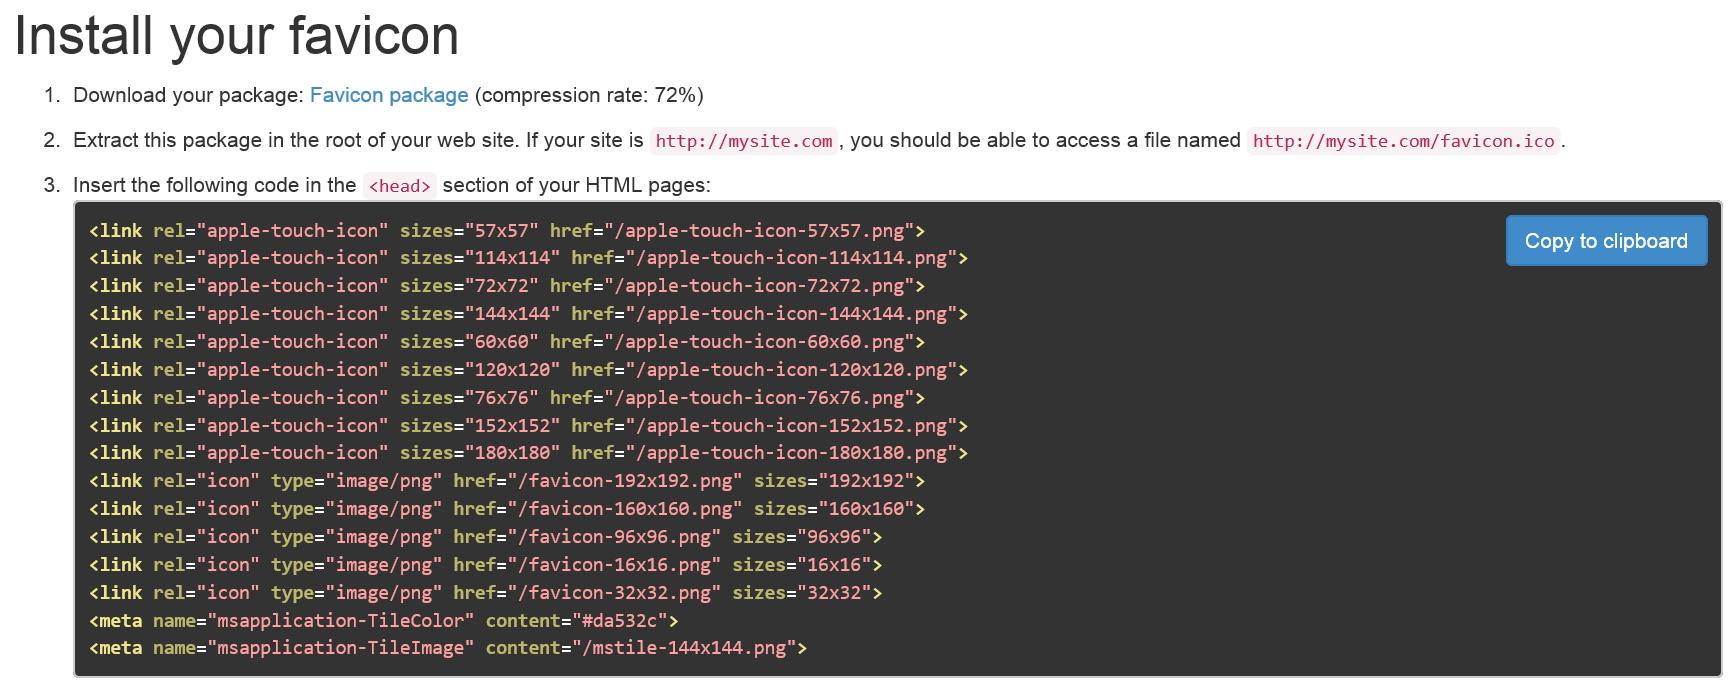 Real Favicon Generator - онлайновый генератор favicon для разных браузеров